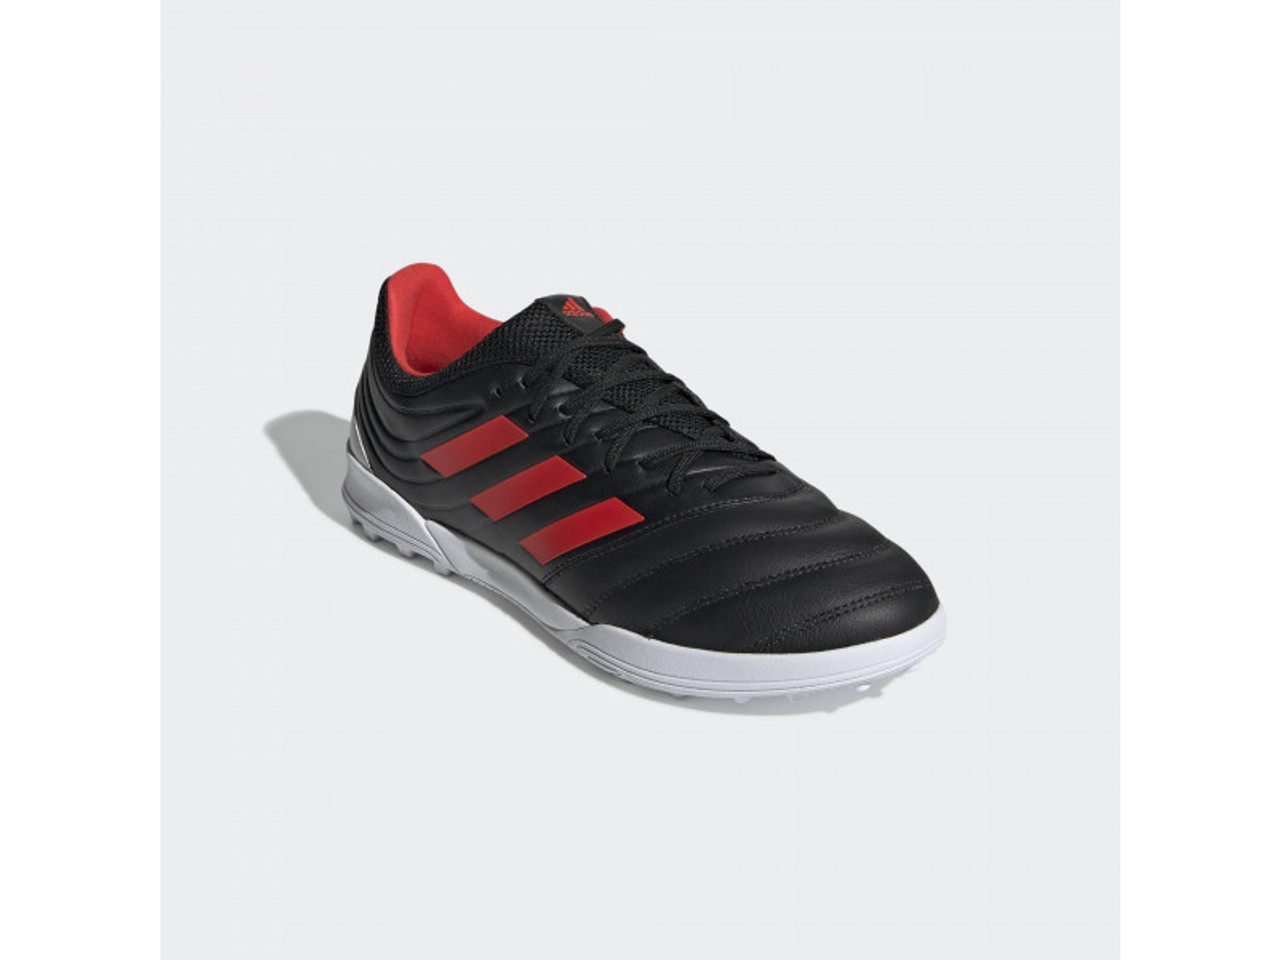 f4f5e6331bd ADIDAS COPA 19.3 IN SALA - Soccer Plus